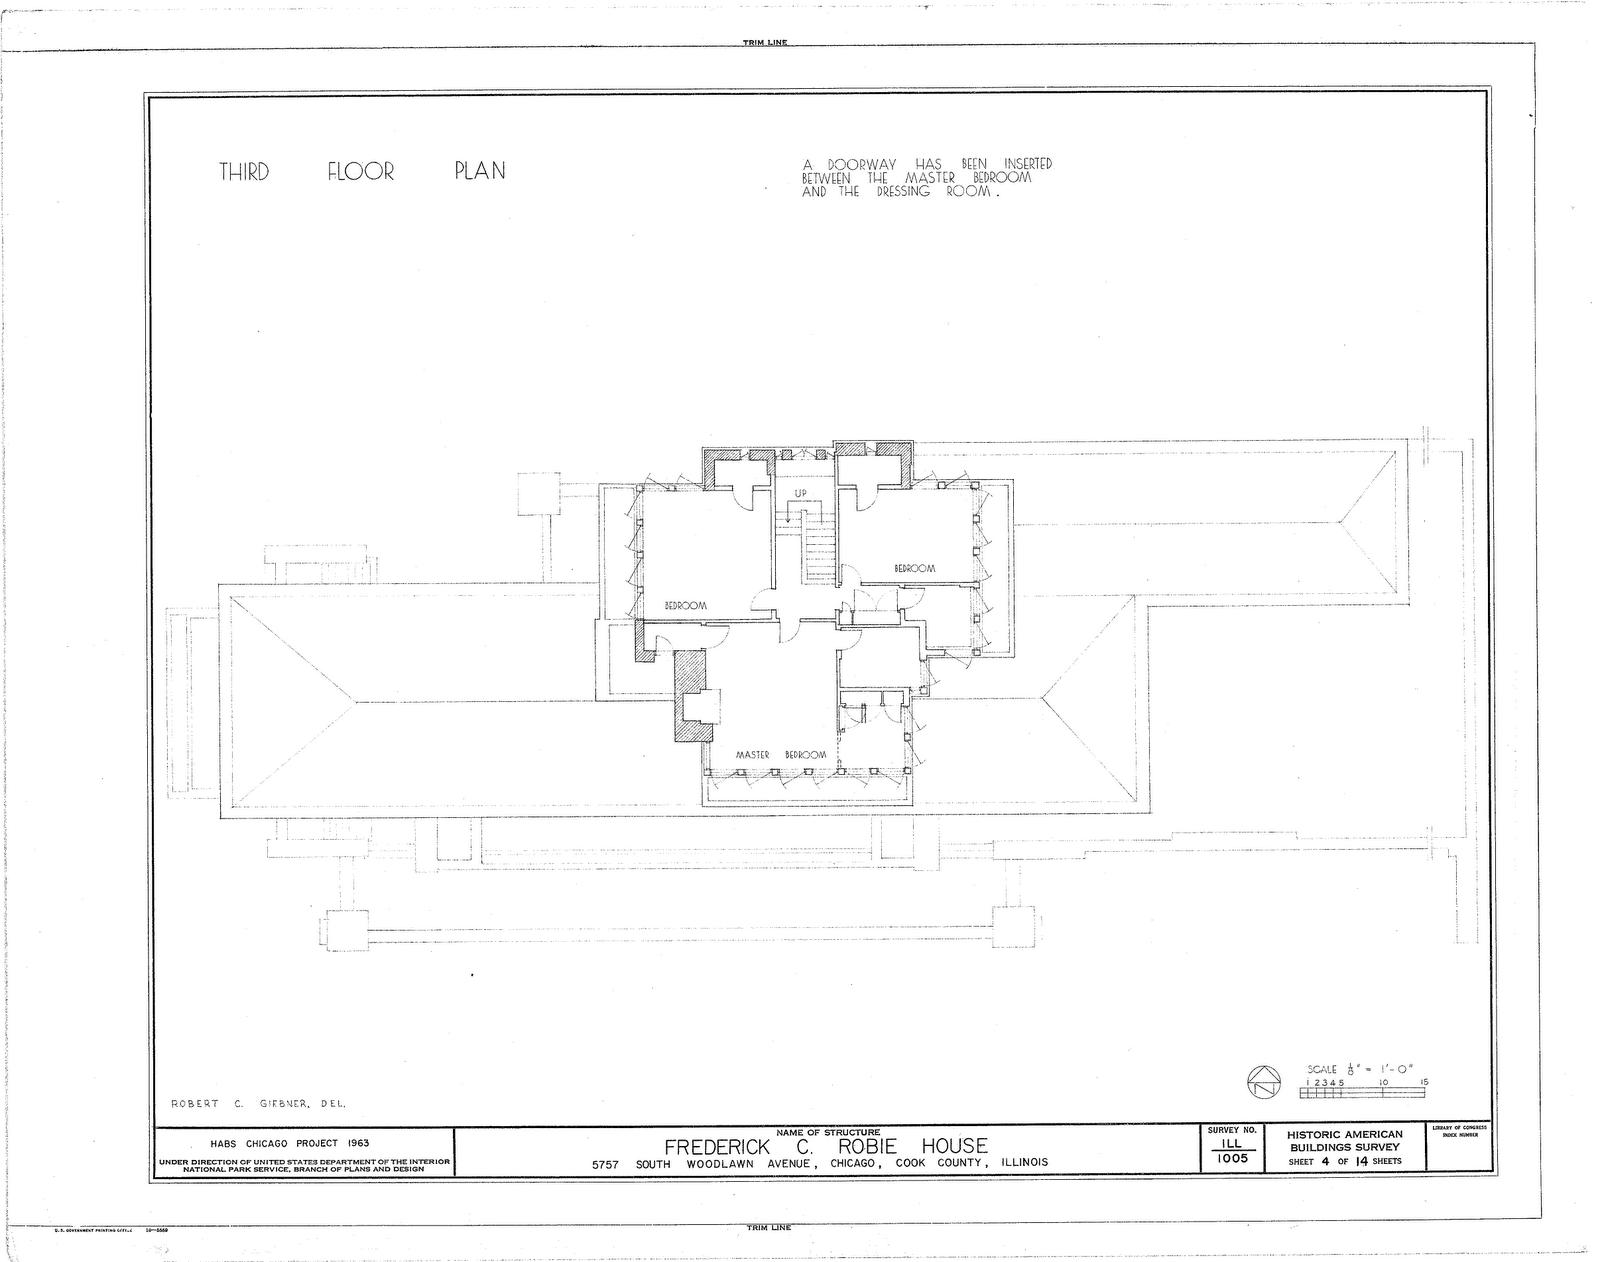 ARCHITECTURE STUDENT'S CORNER: F.L.WRIGHT'S BUILDINGS